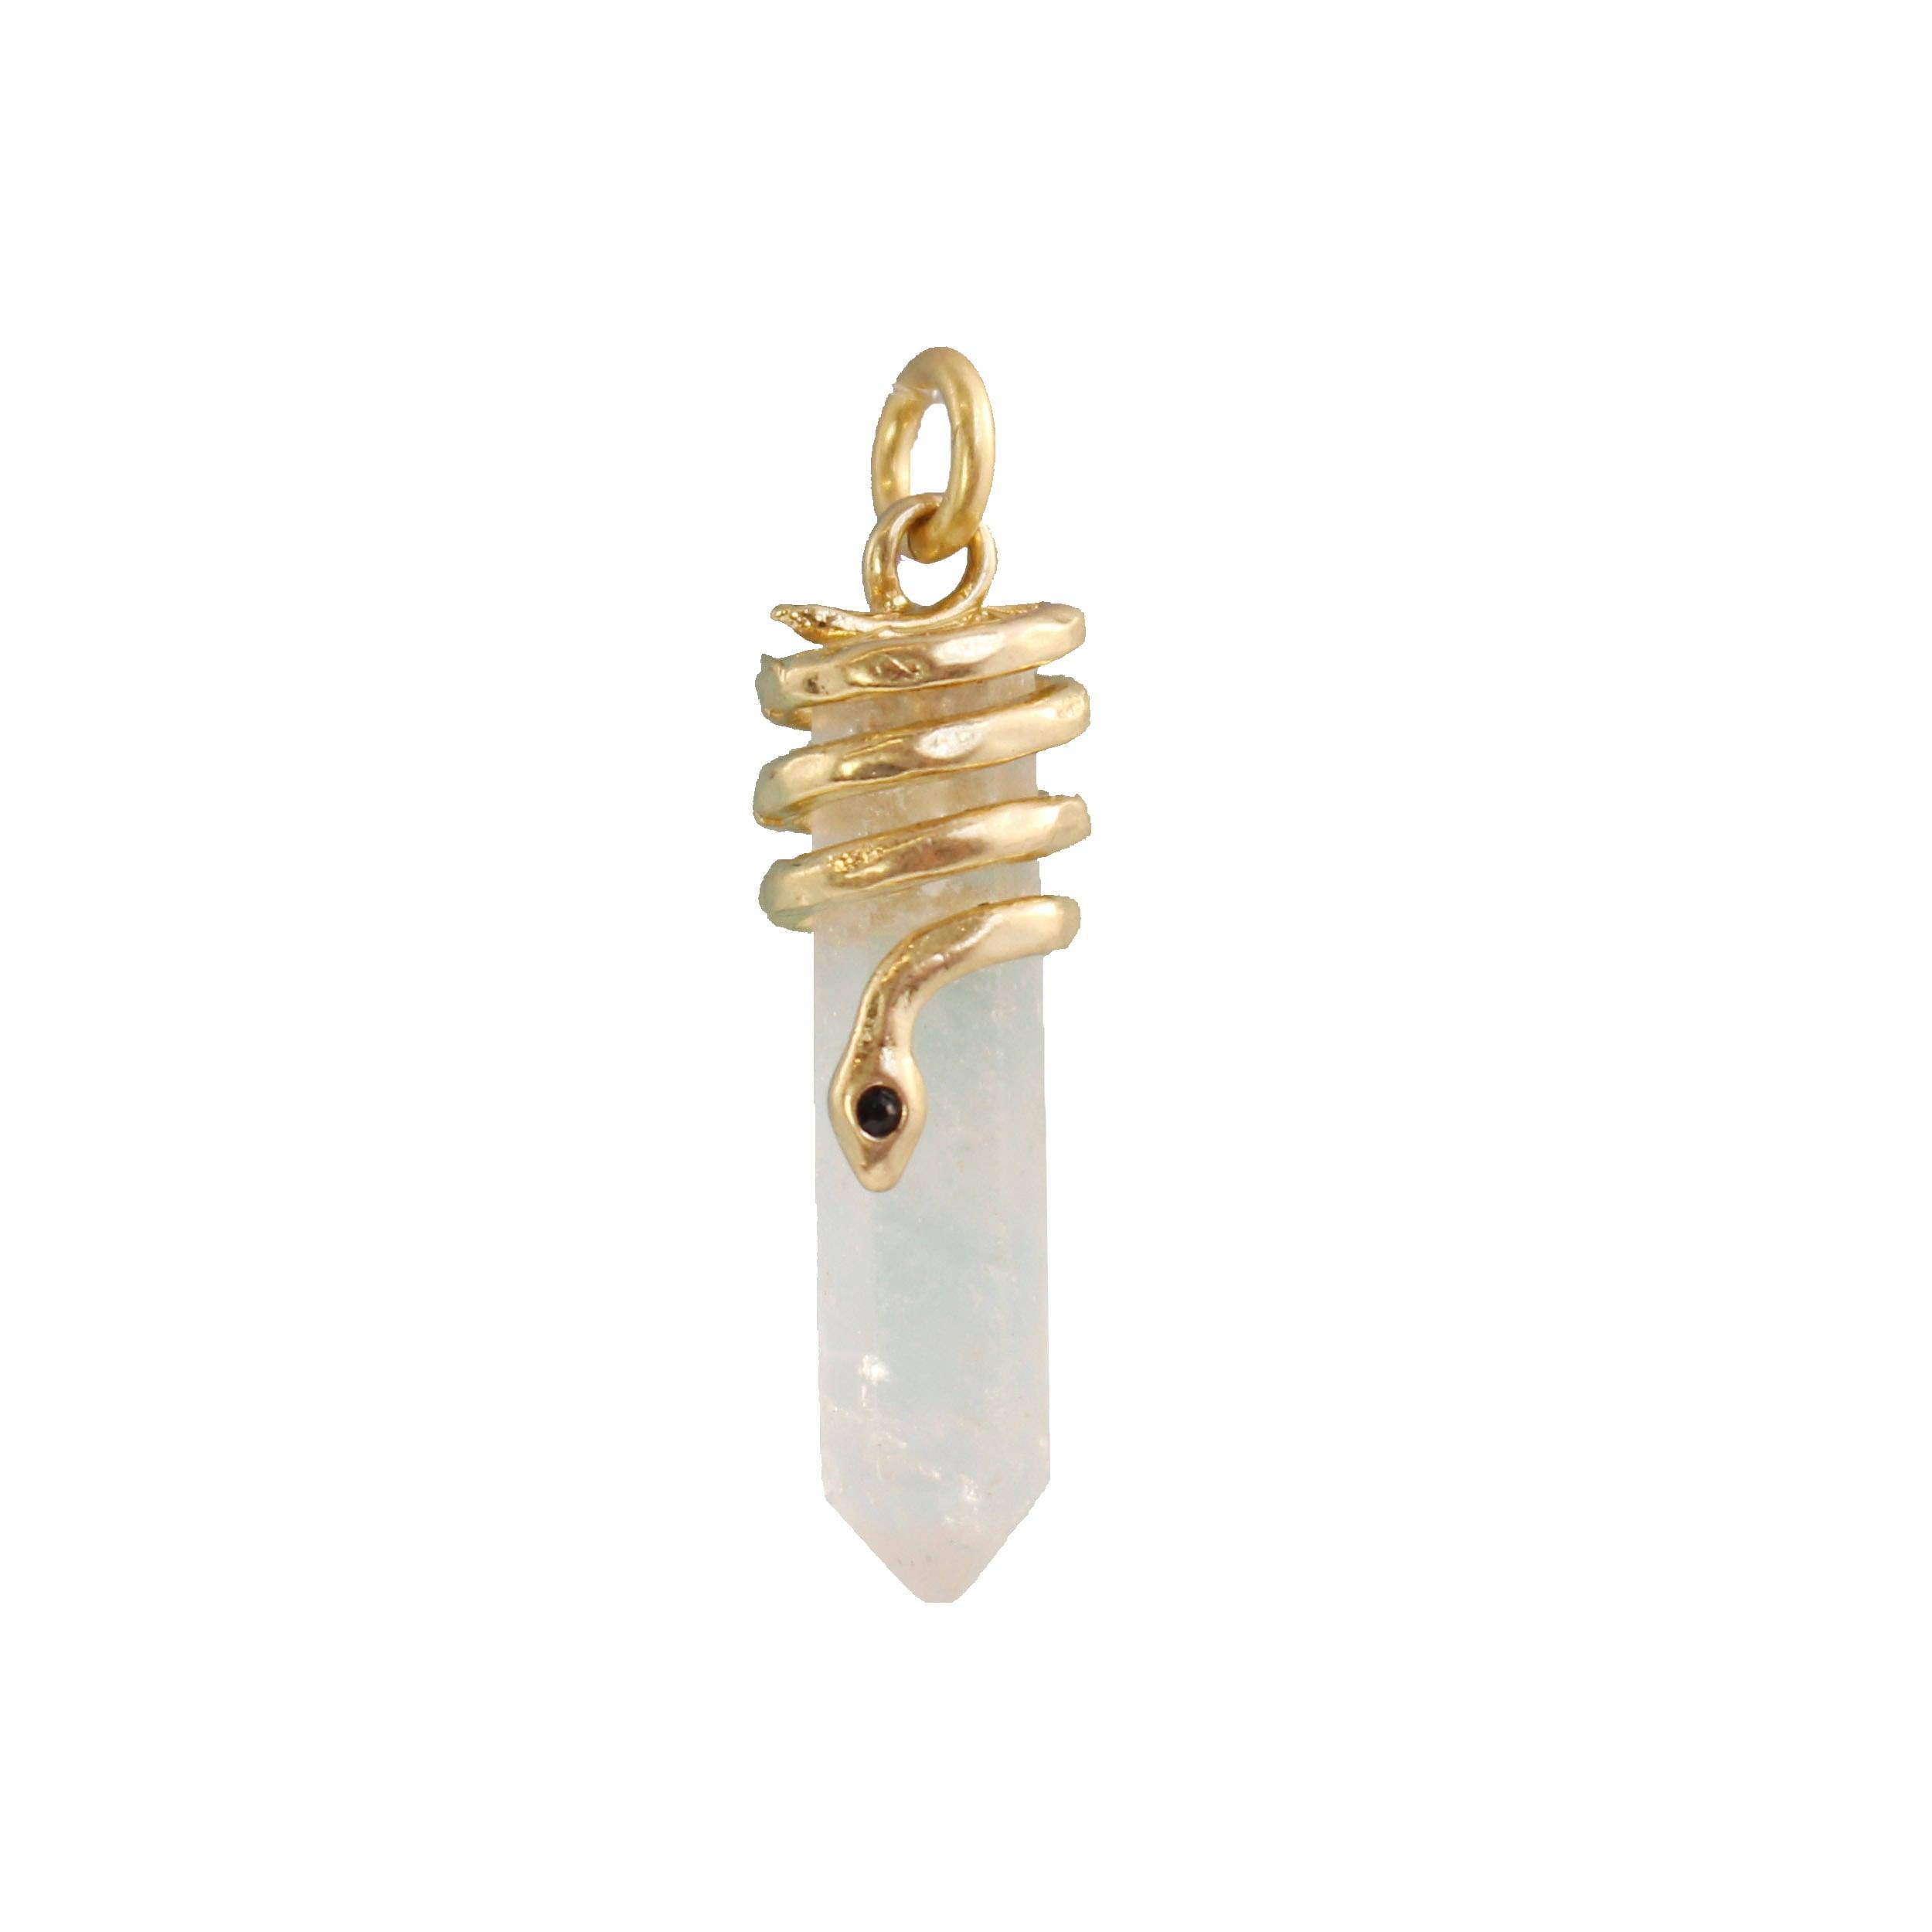 serpent de cristal charme pendentif quartz clair or etsy. Black Bedroom Furniture Sets. Home Design Ideas